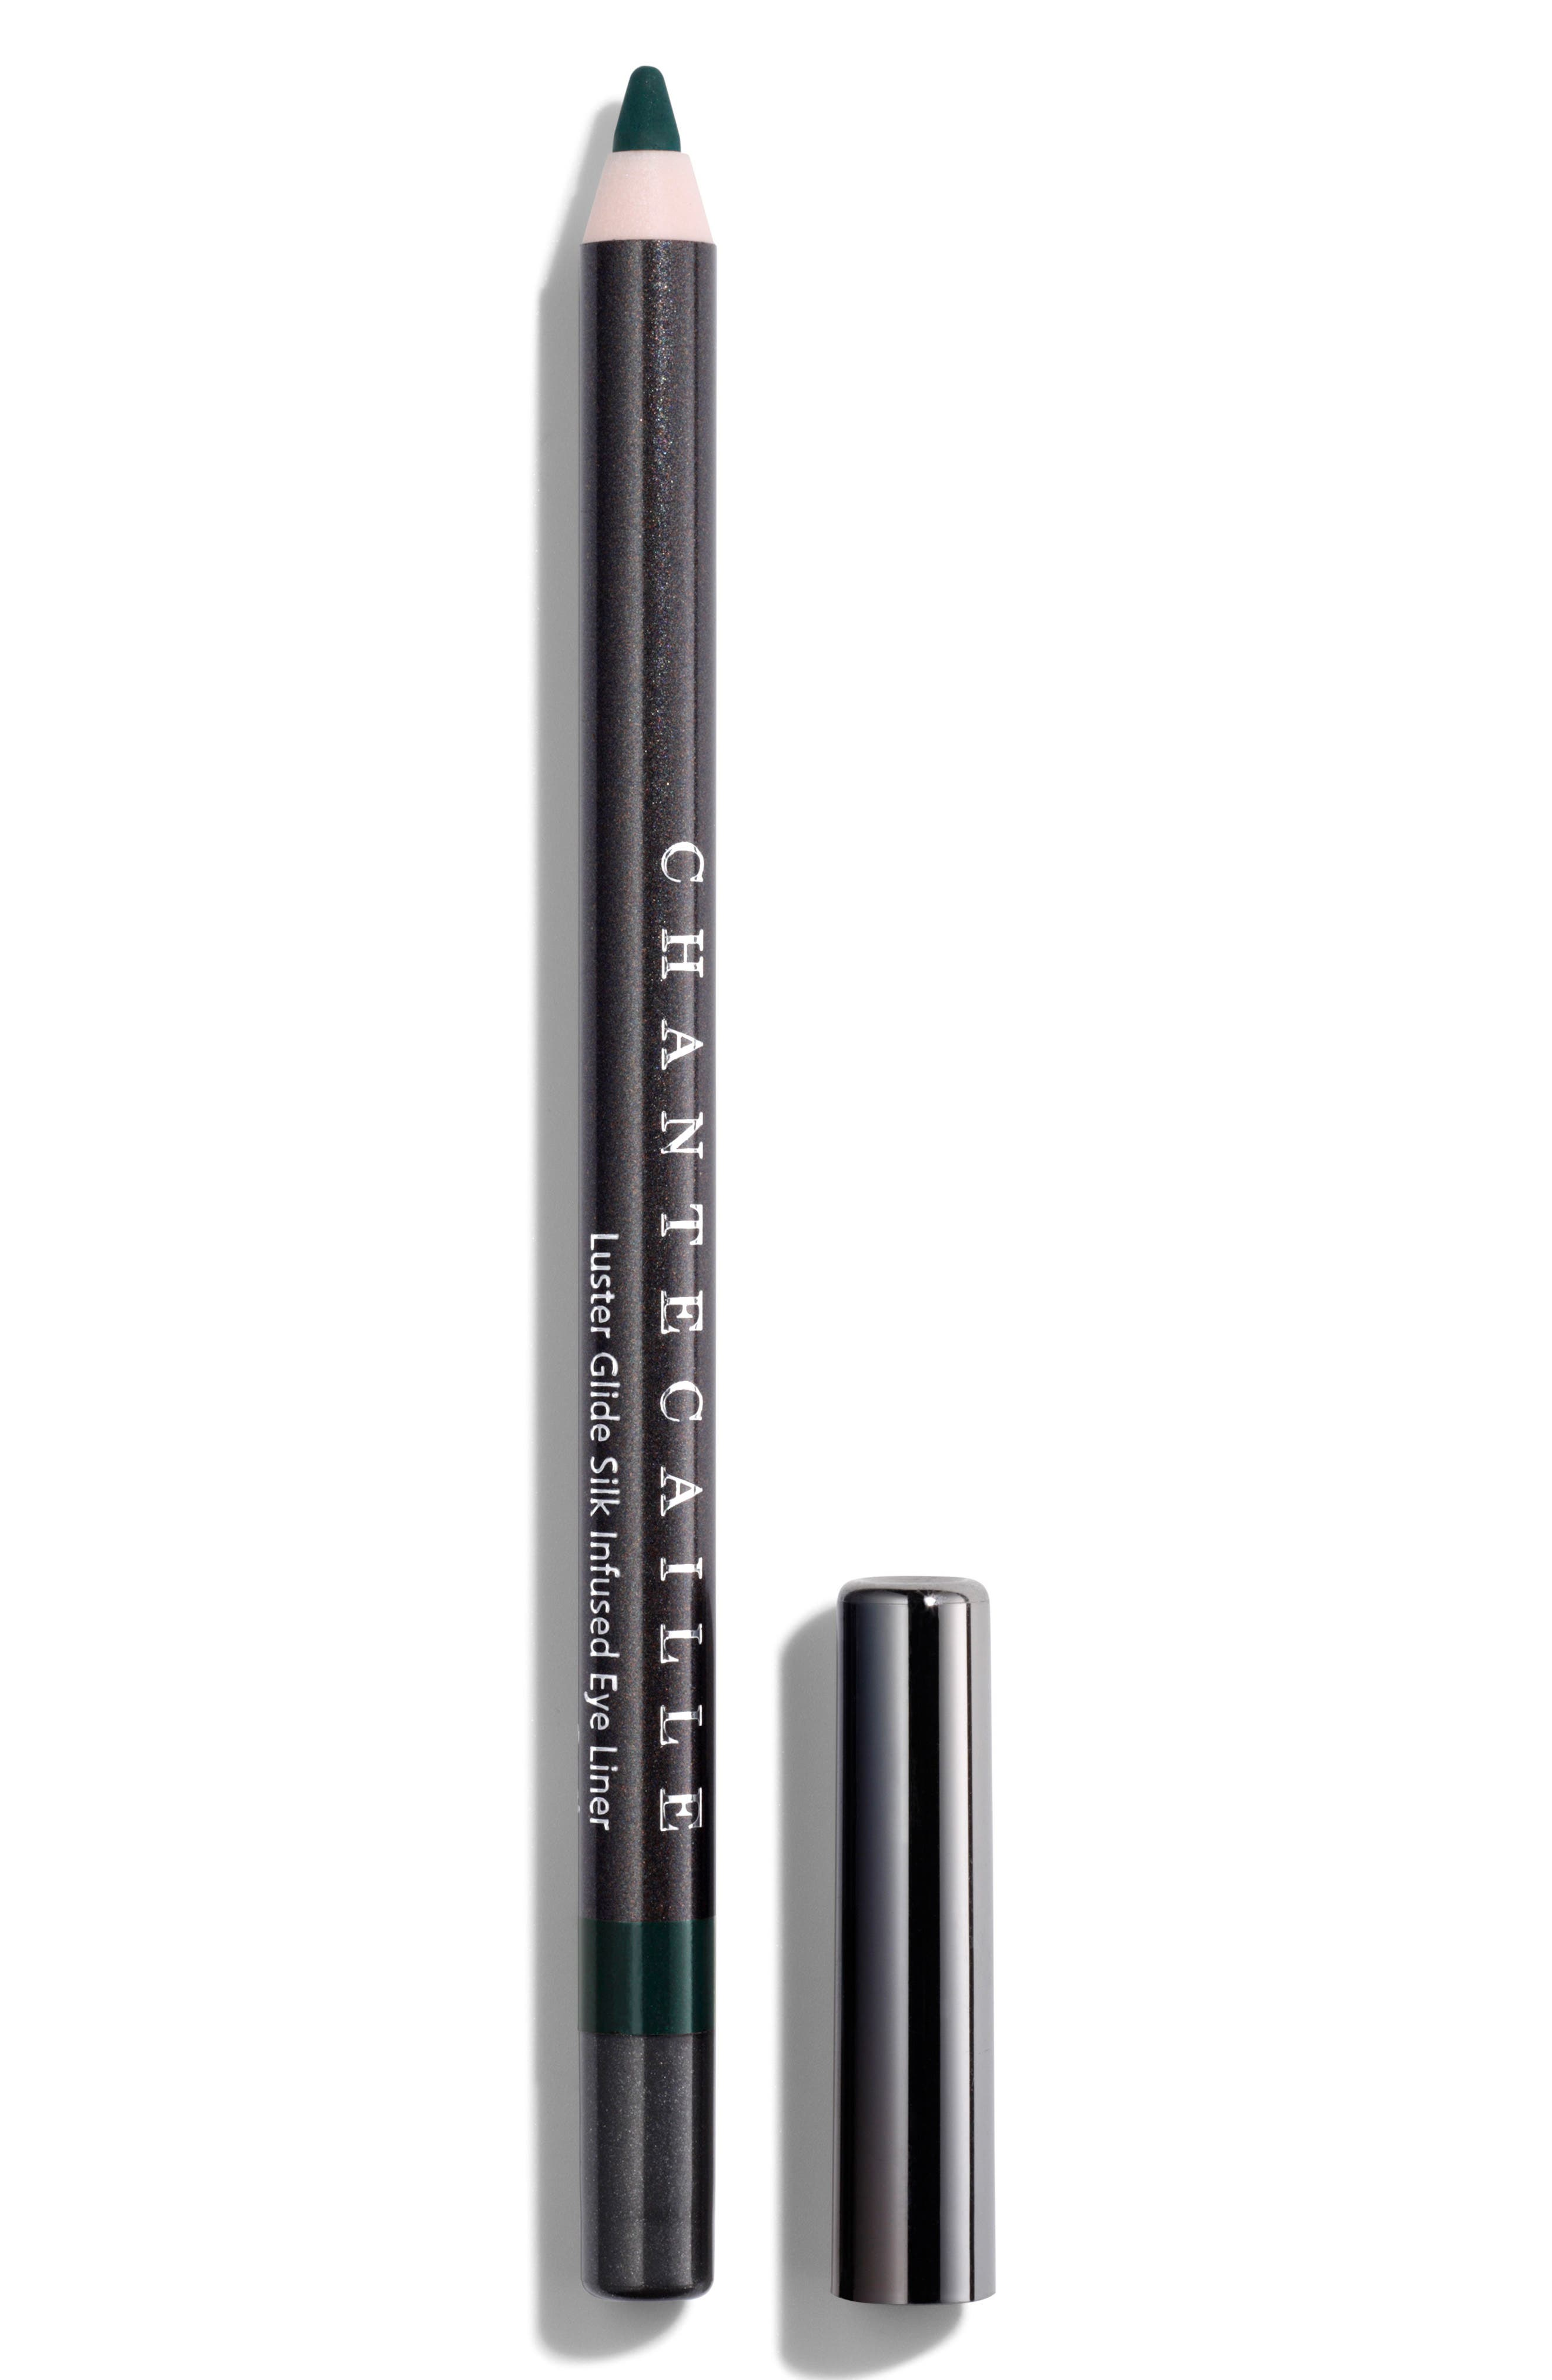 Chantecaille Luster Glide Silk Infused Eyeliner - Black Forest